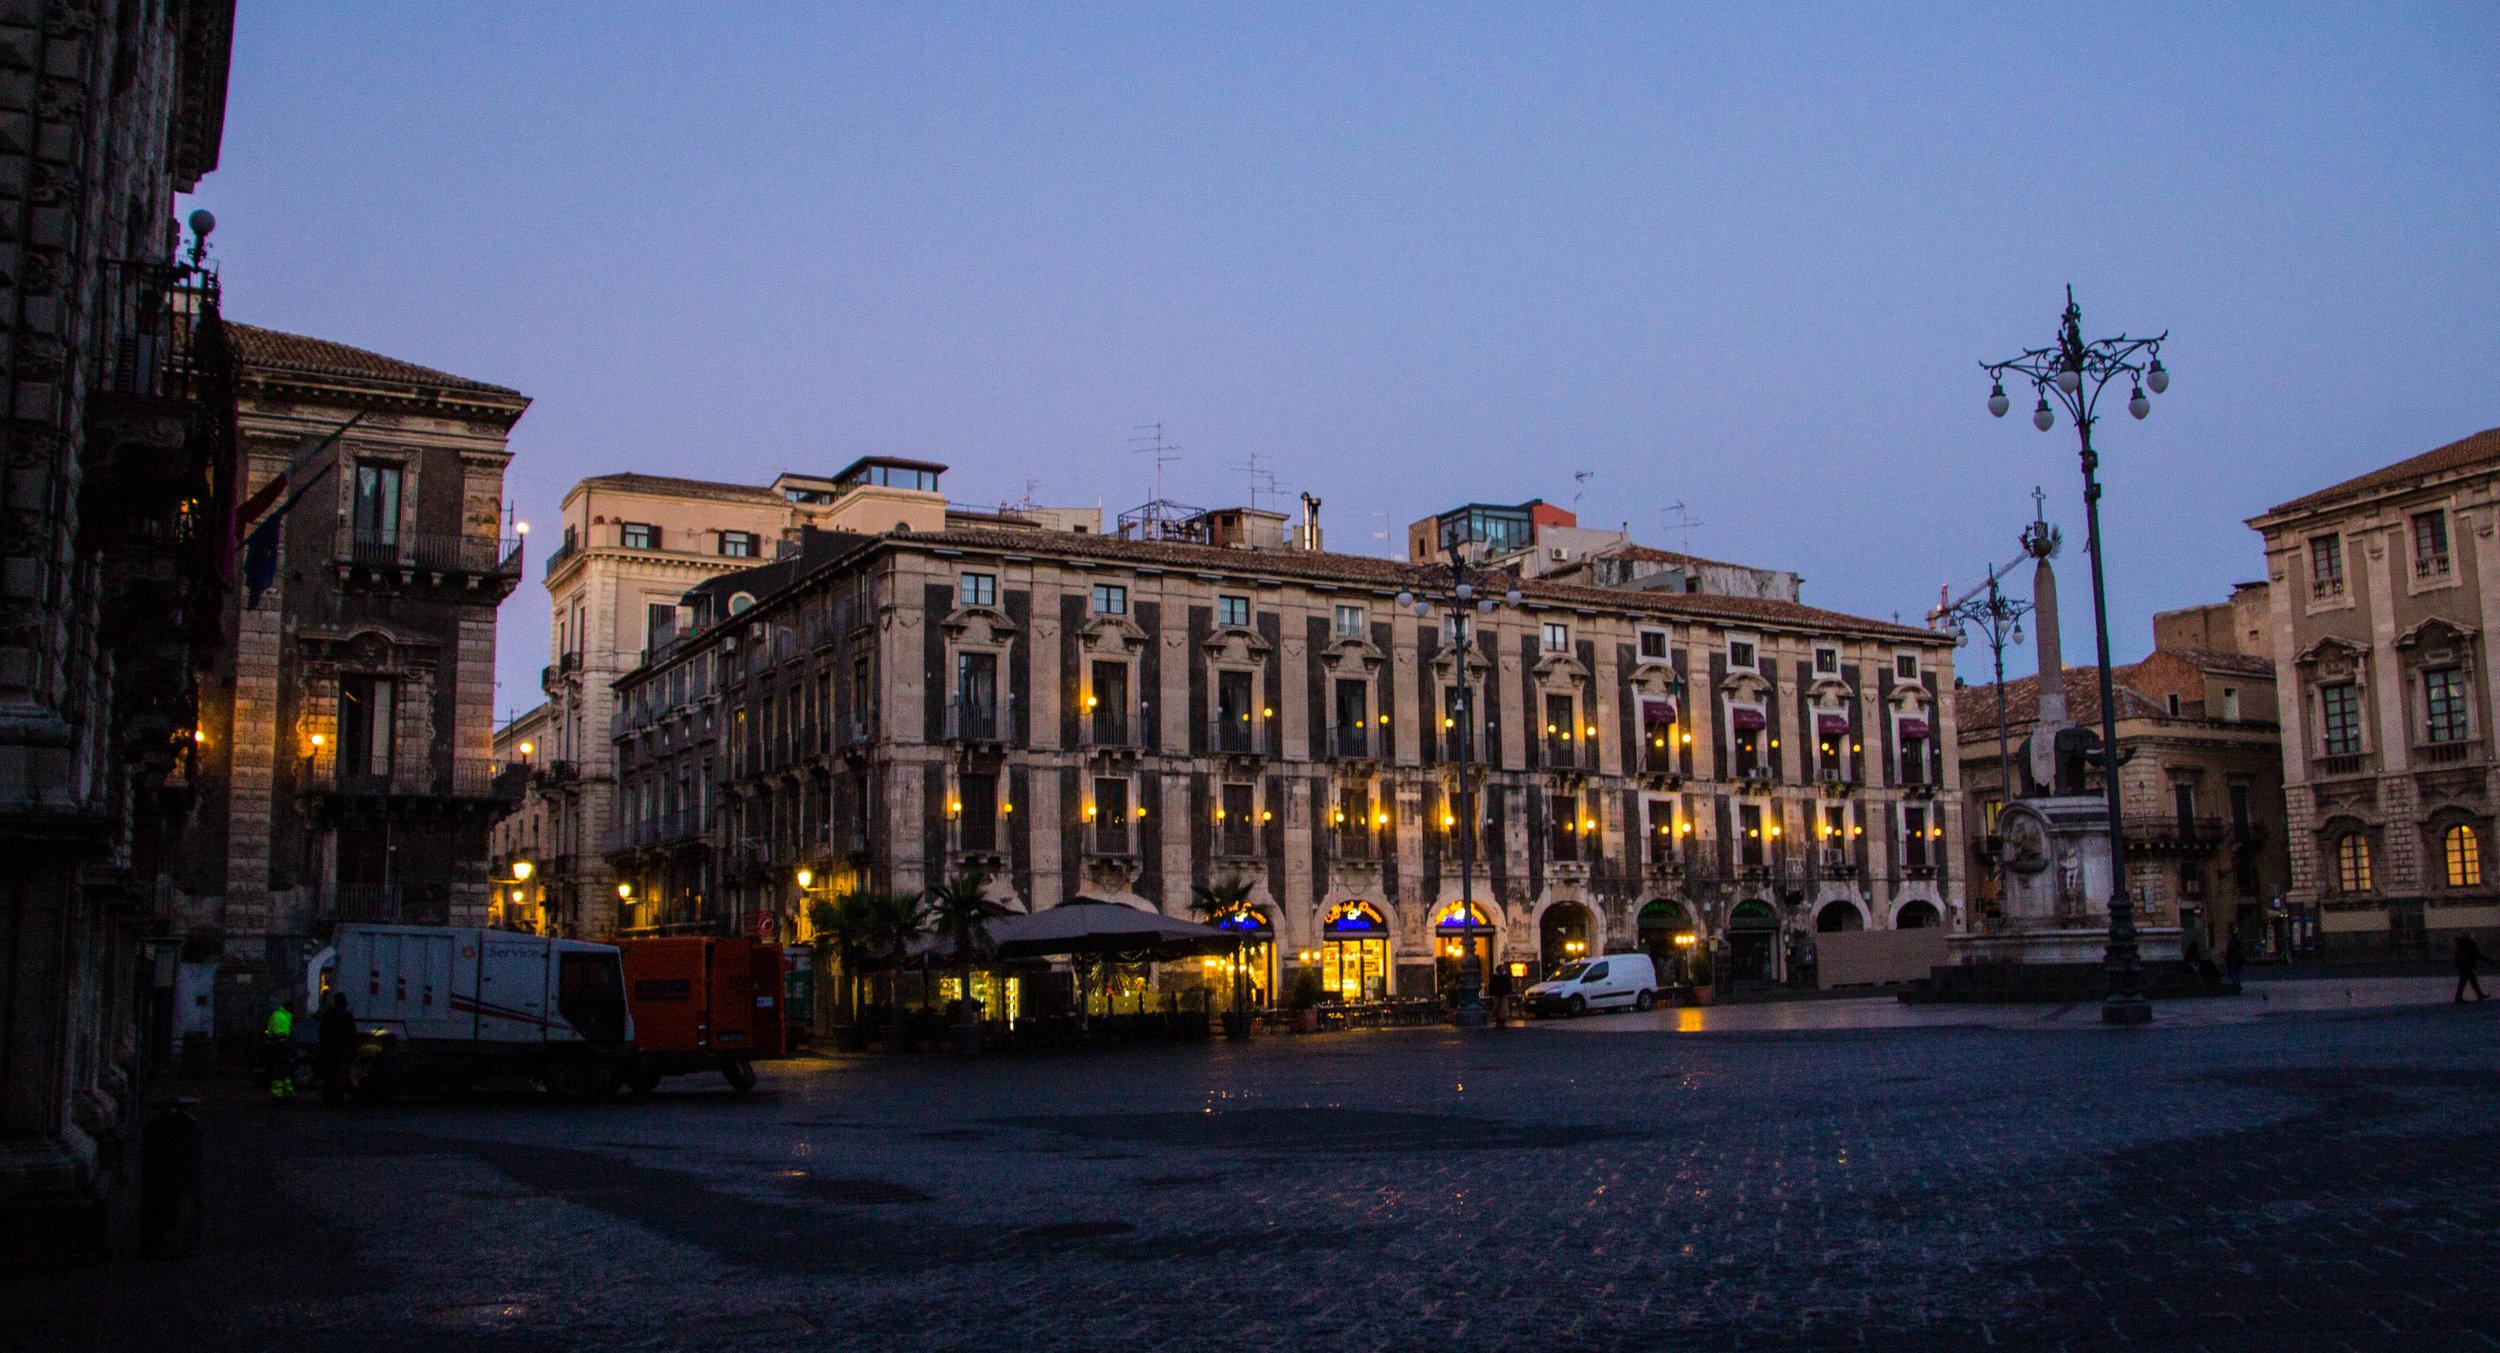 piazza-duomo-catania-sicily-2.jpg